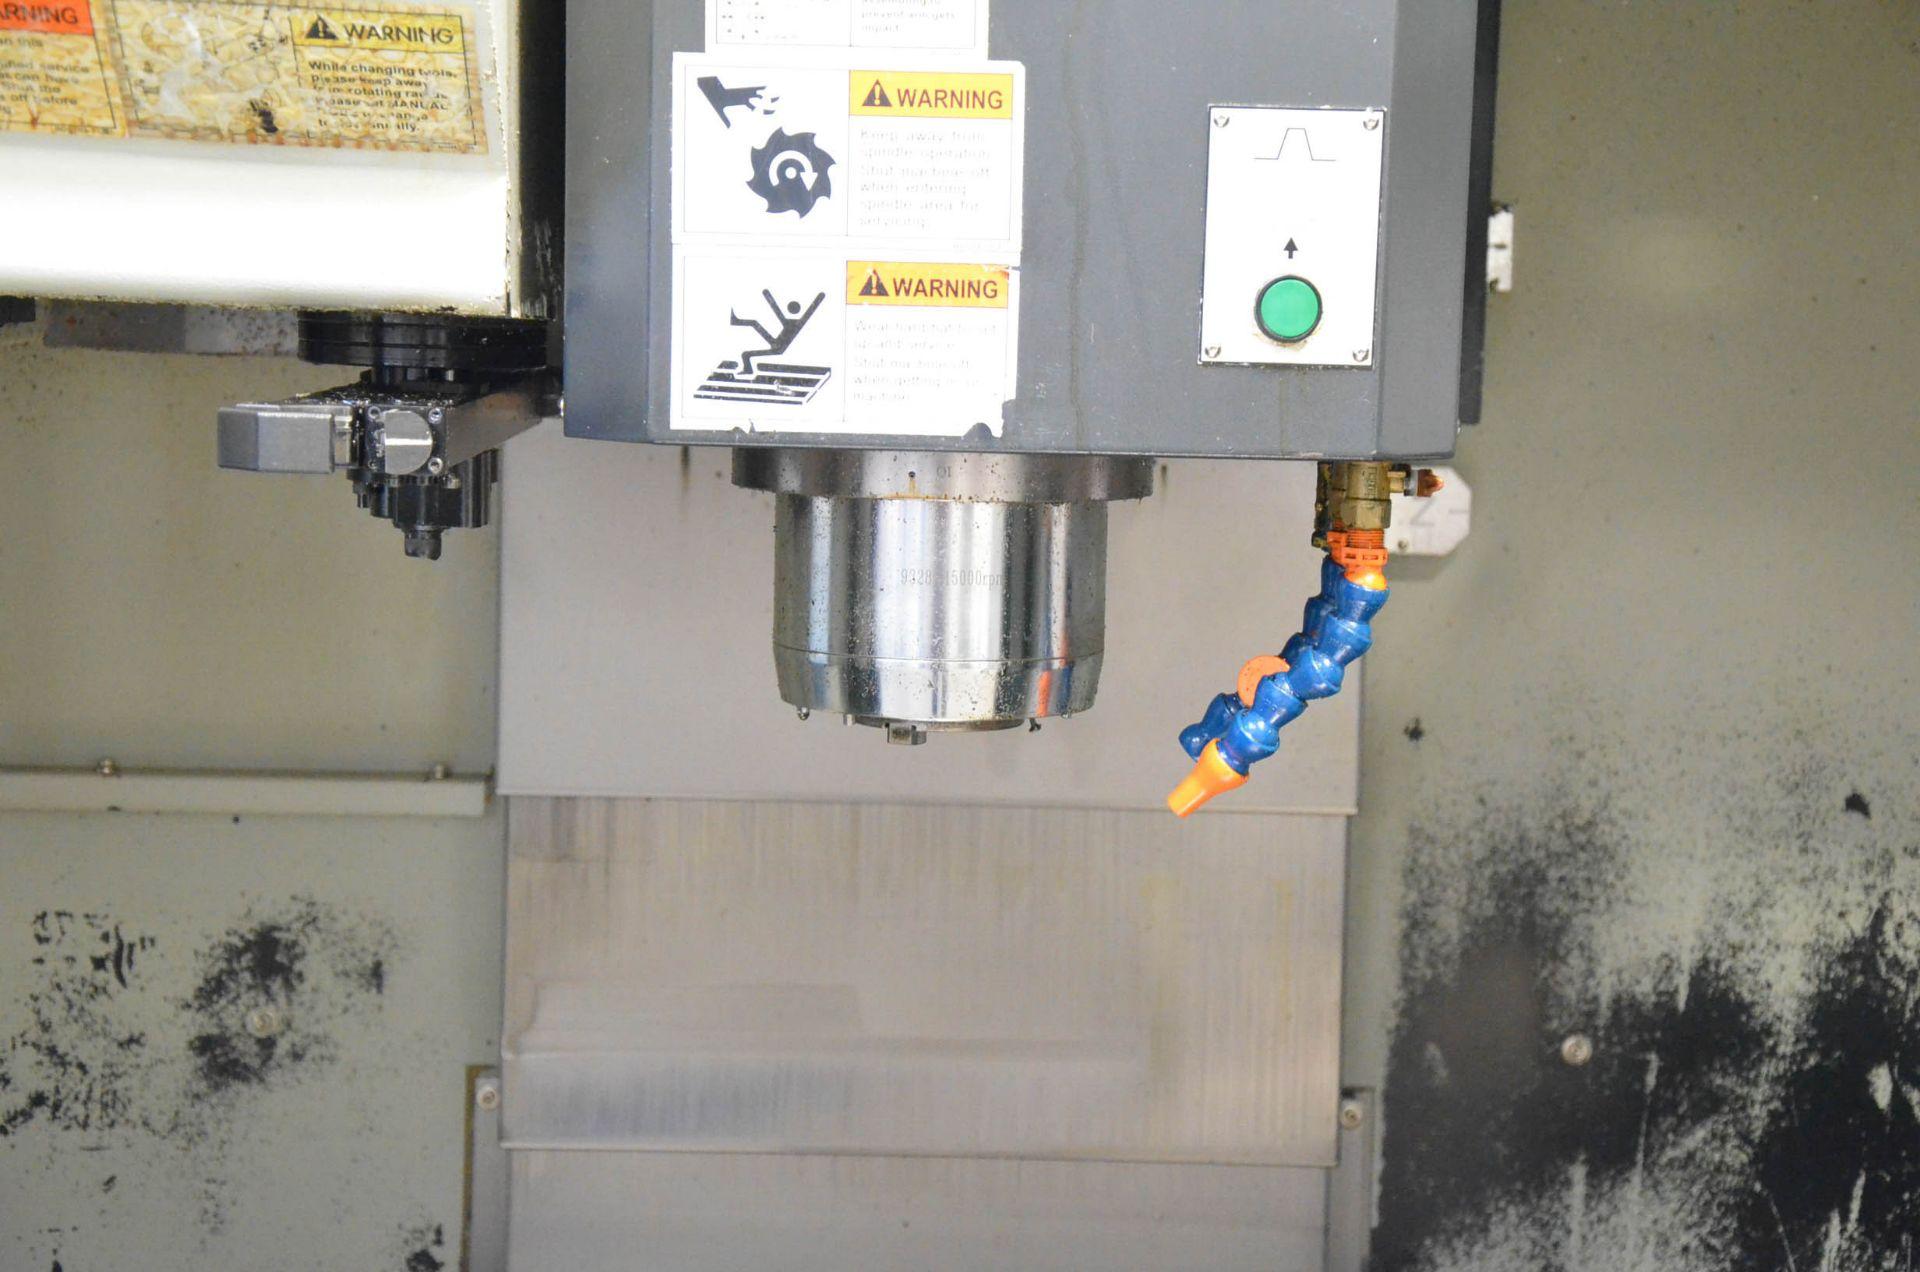 AWEA YAMA SEIKI (2012) AF-1250 CNC VERTICAL MACHINING CENTER WITH FANUC SERIES 31I-MODEL B CNC - Image 4 of 10